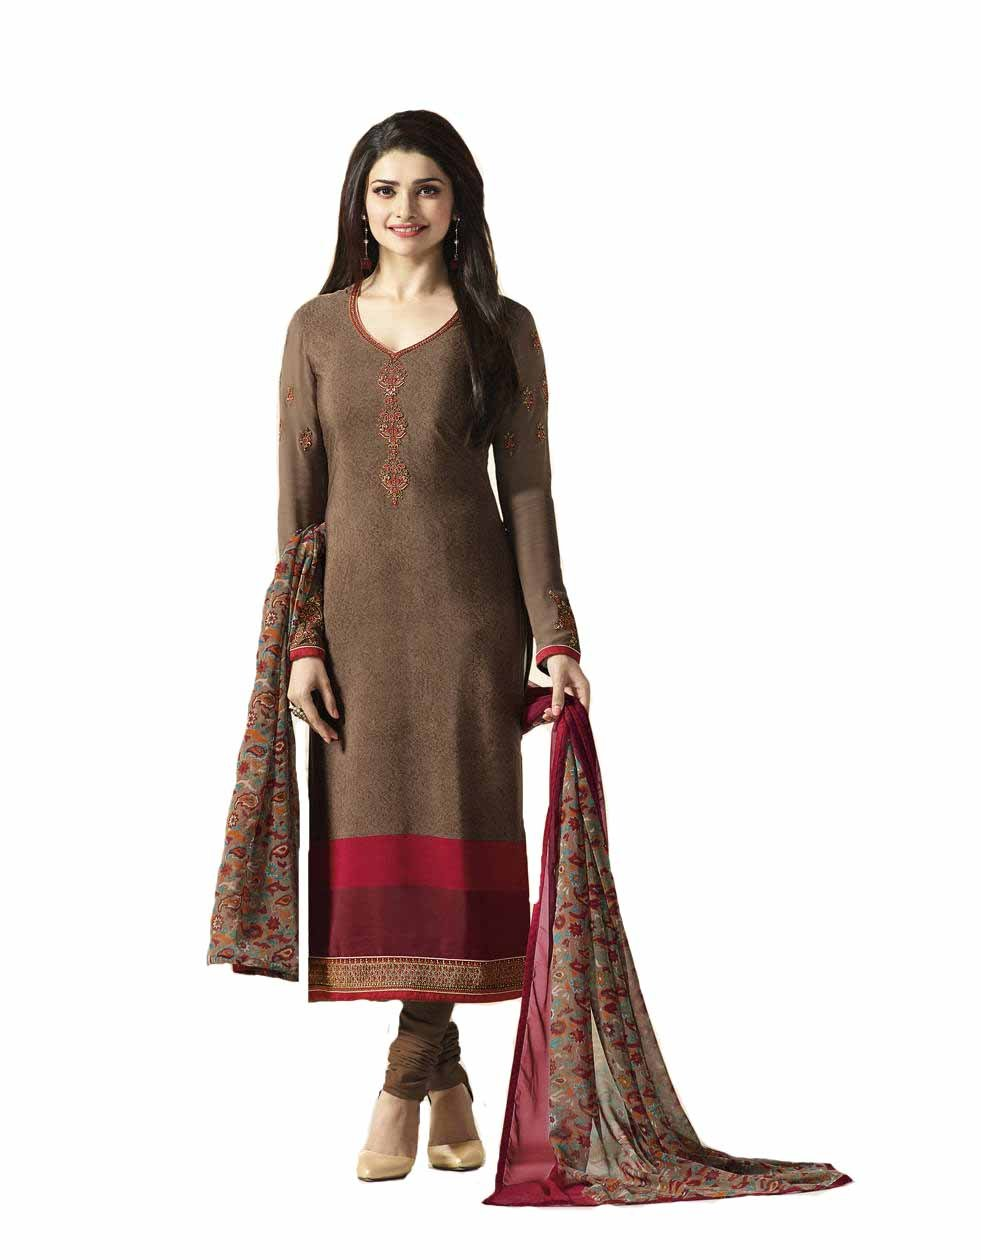 DELISA Reddymade, salwar kameez for womens, indian/pakistani fashion salwar kameez